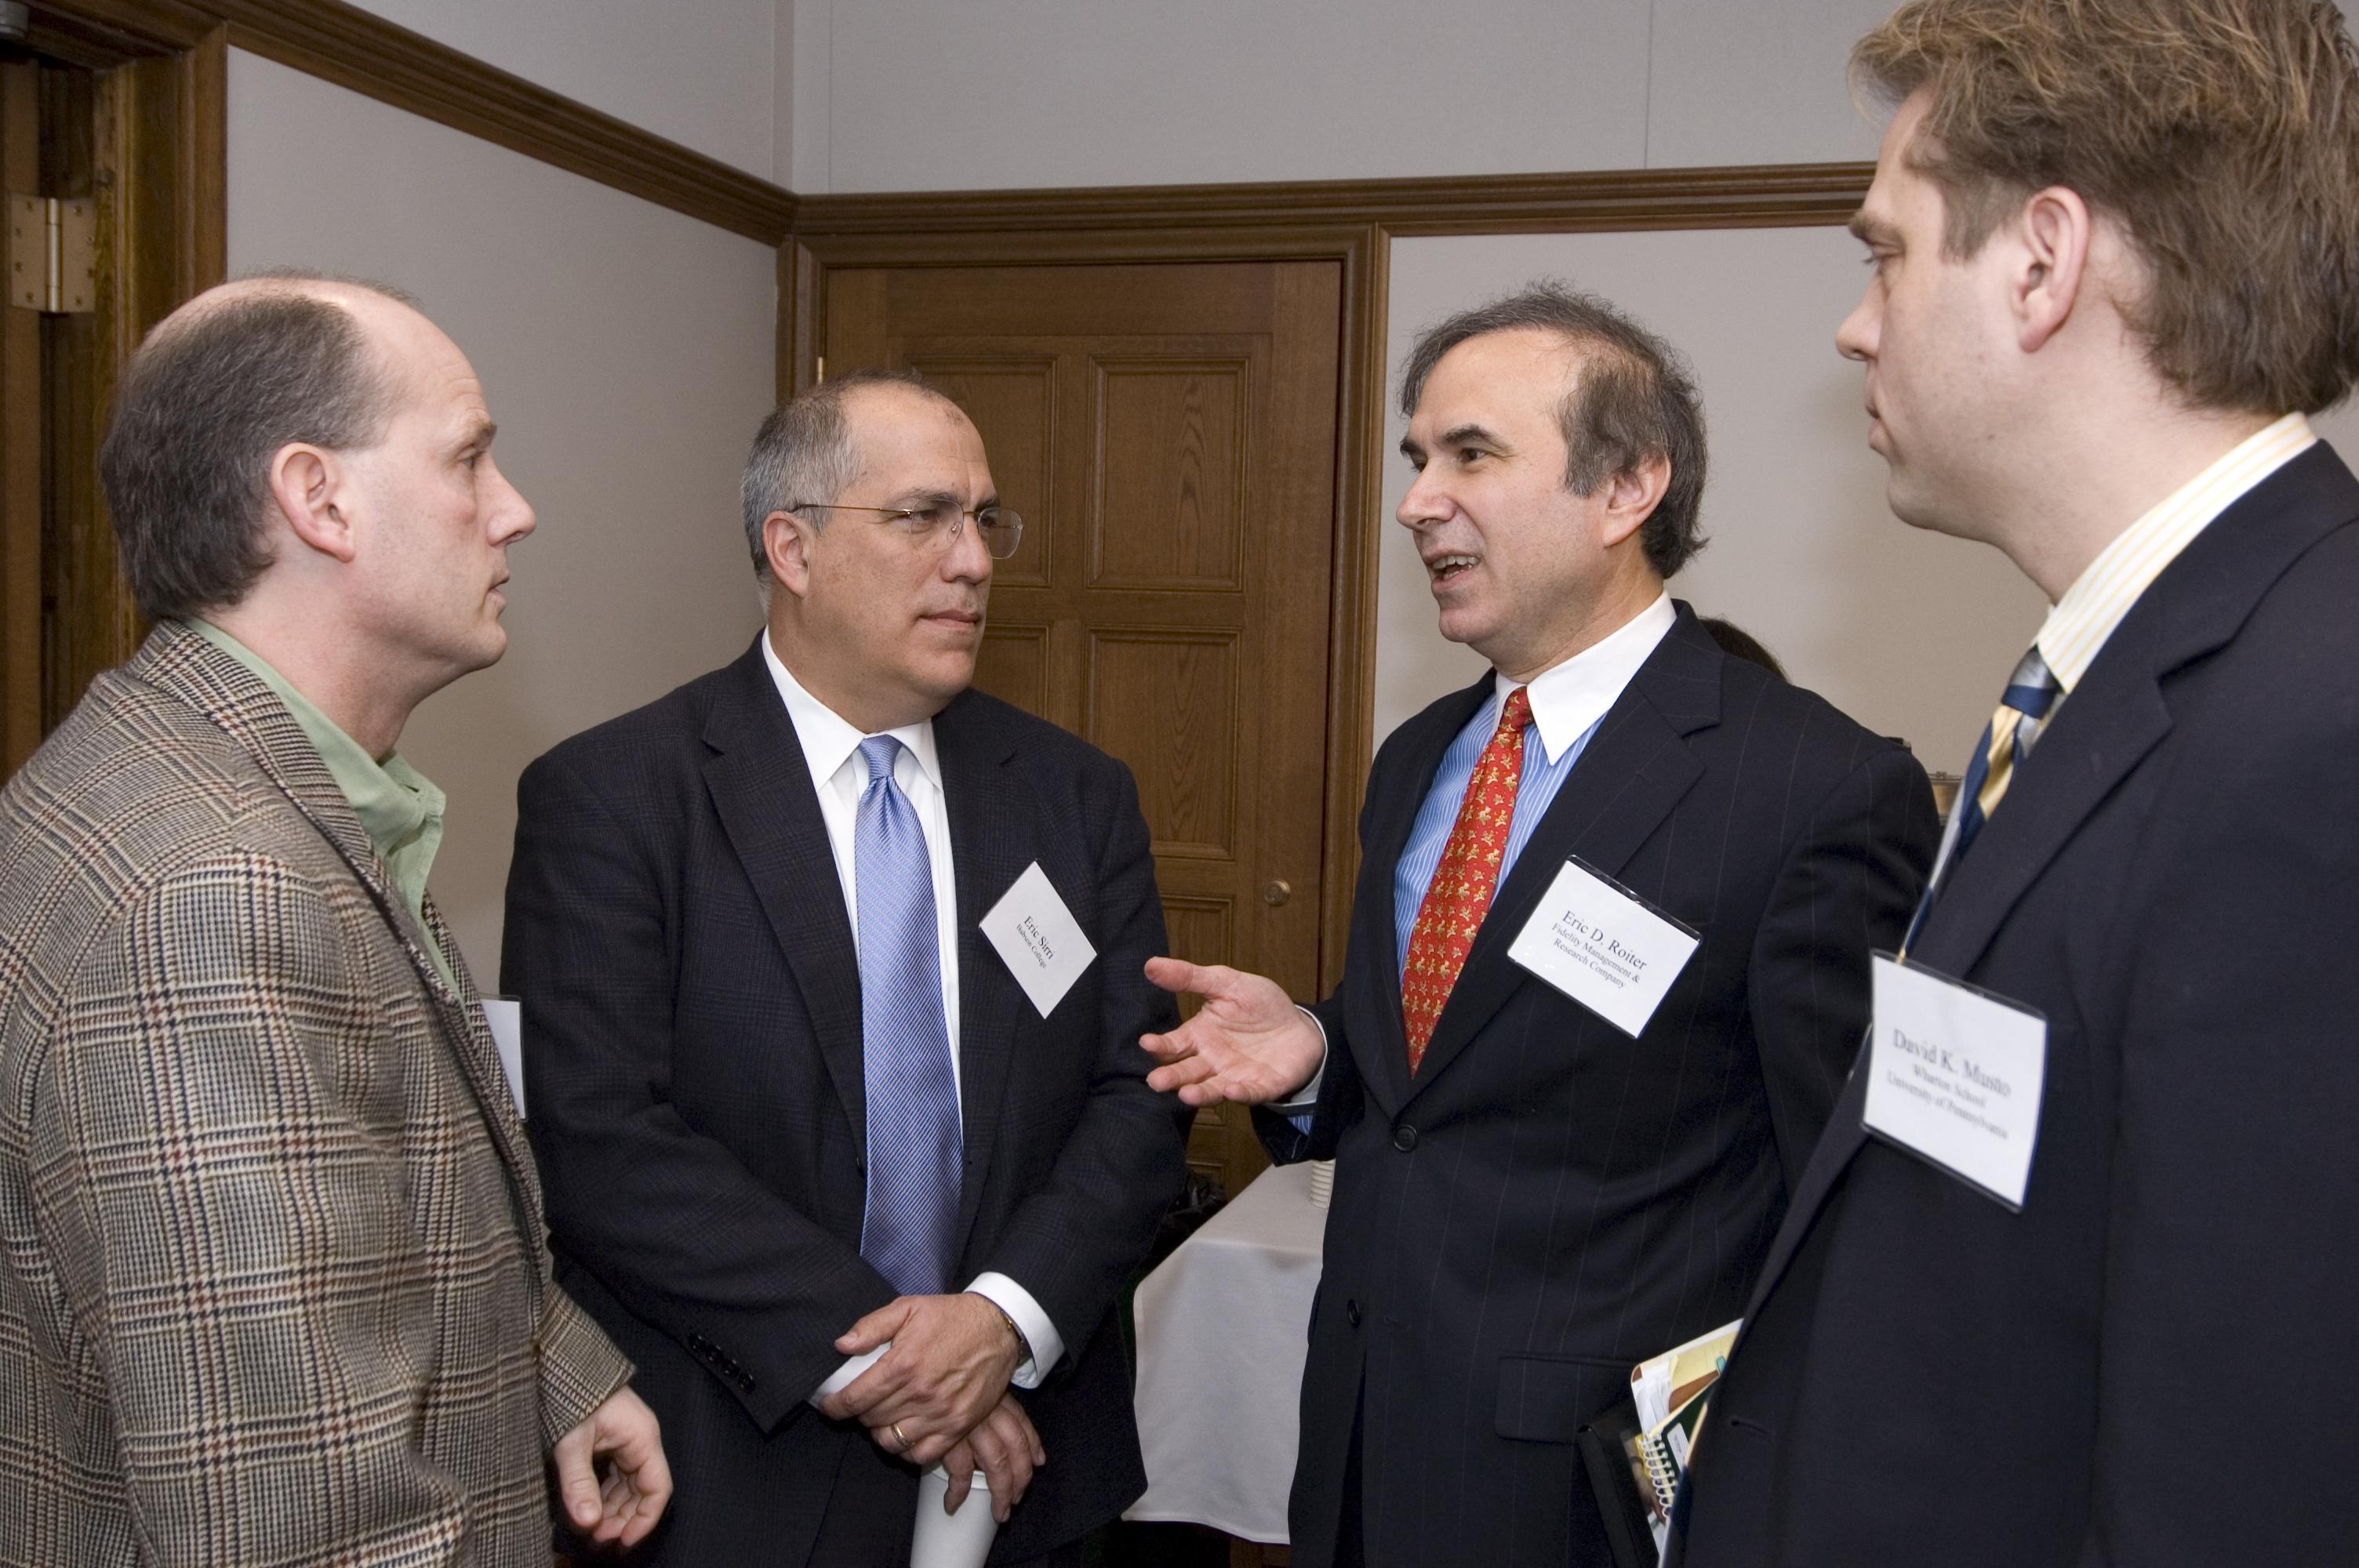 Hon. Leo Strine, Babson College Prof. Erik Sirri, Eric Roiter, and Wharton Prof. David Musto